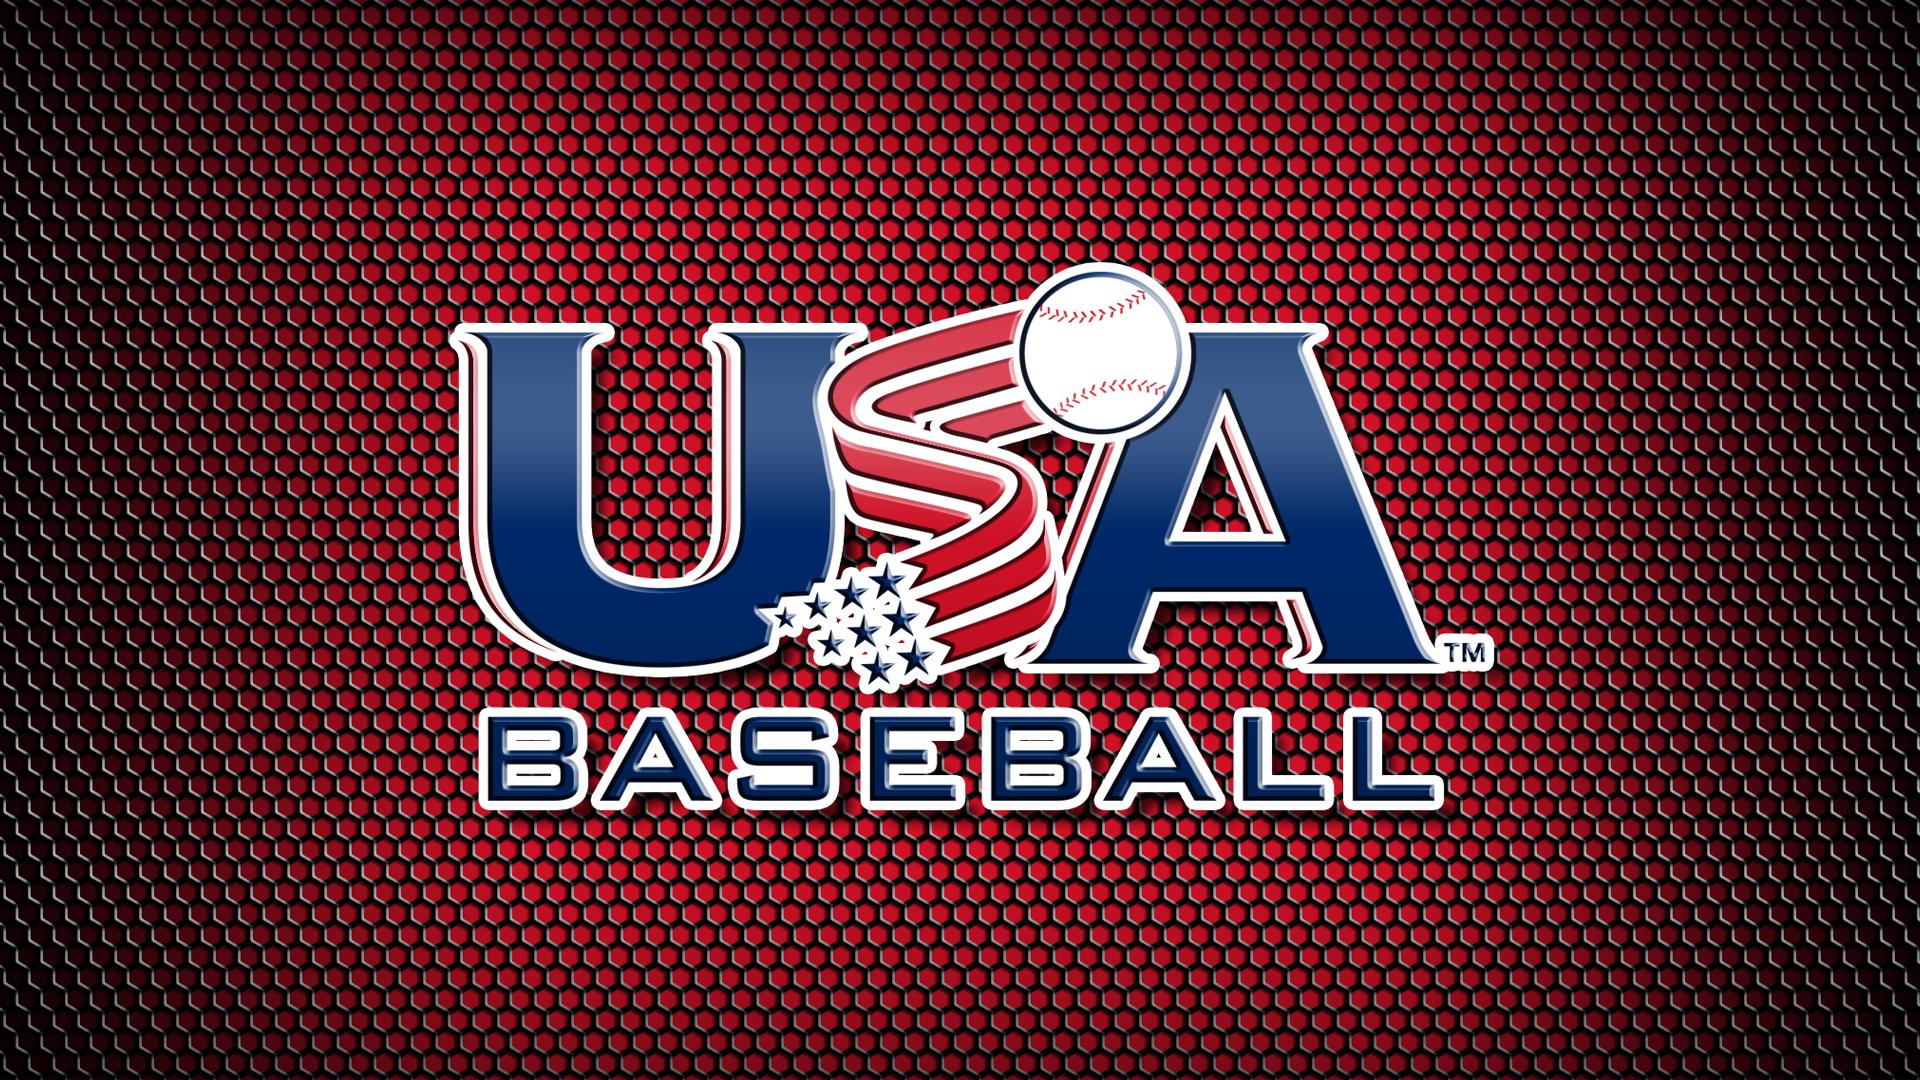 USABaseballcom The official site of USA Baseball 1920x1080